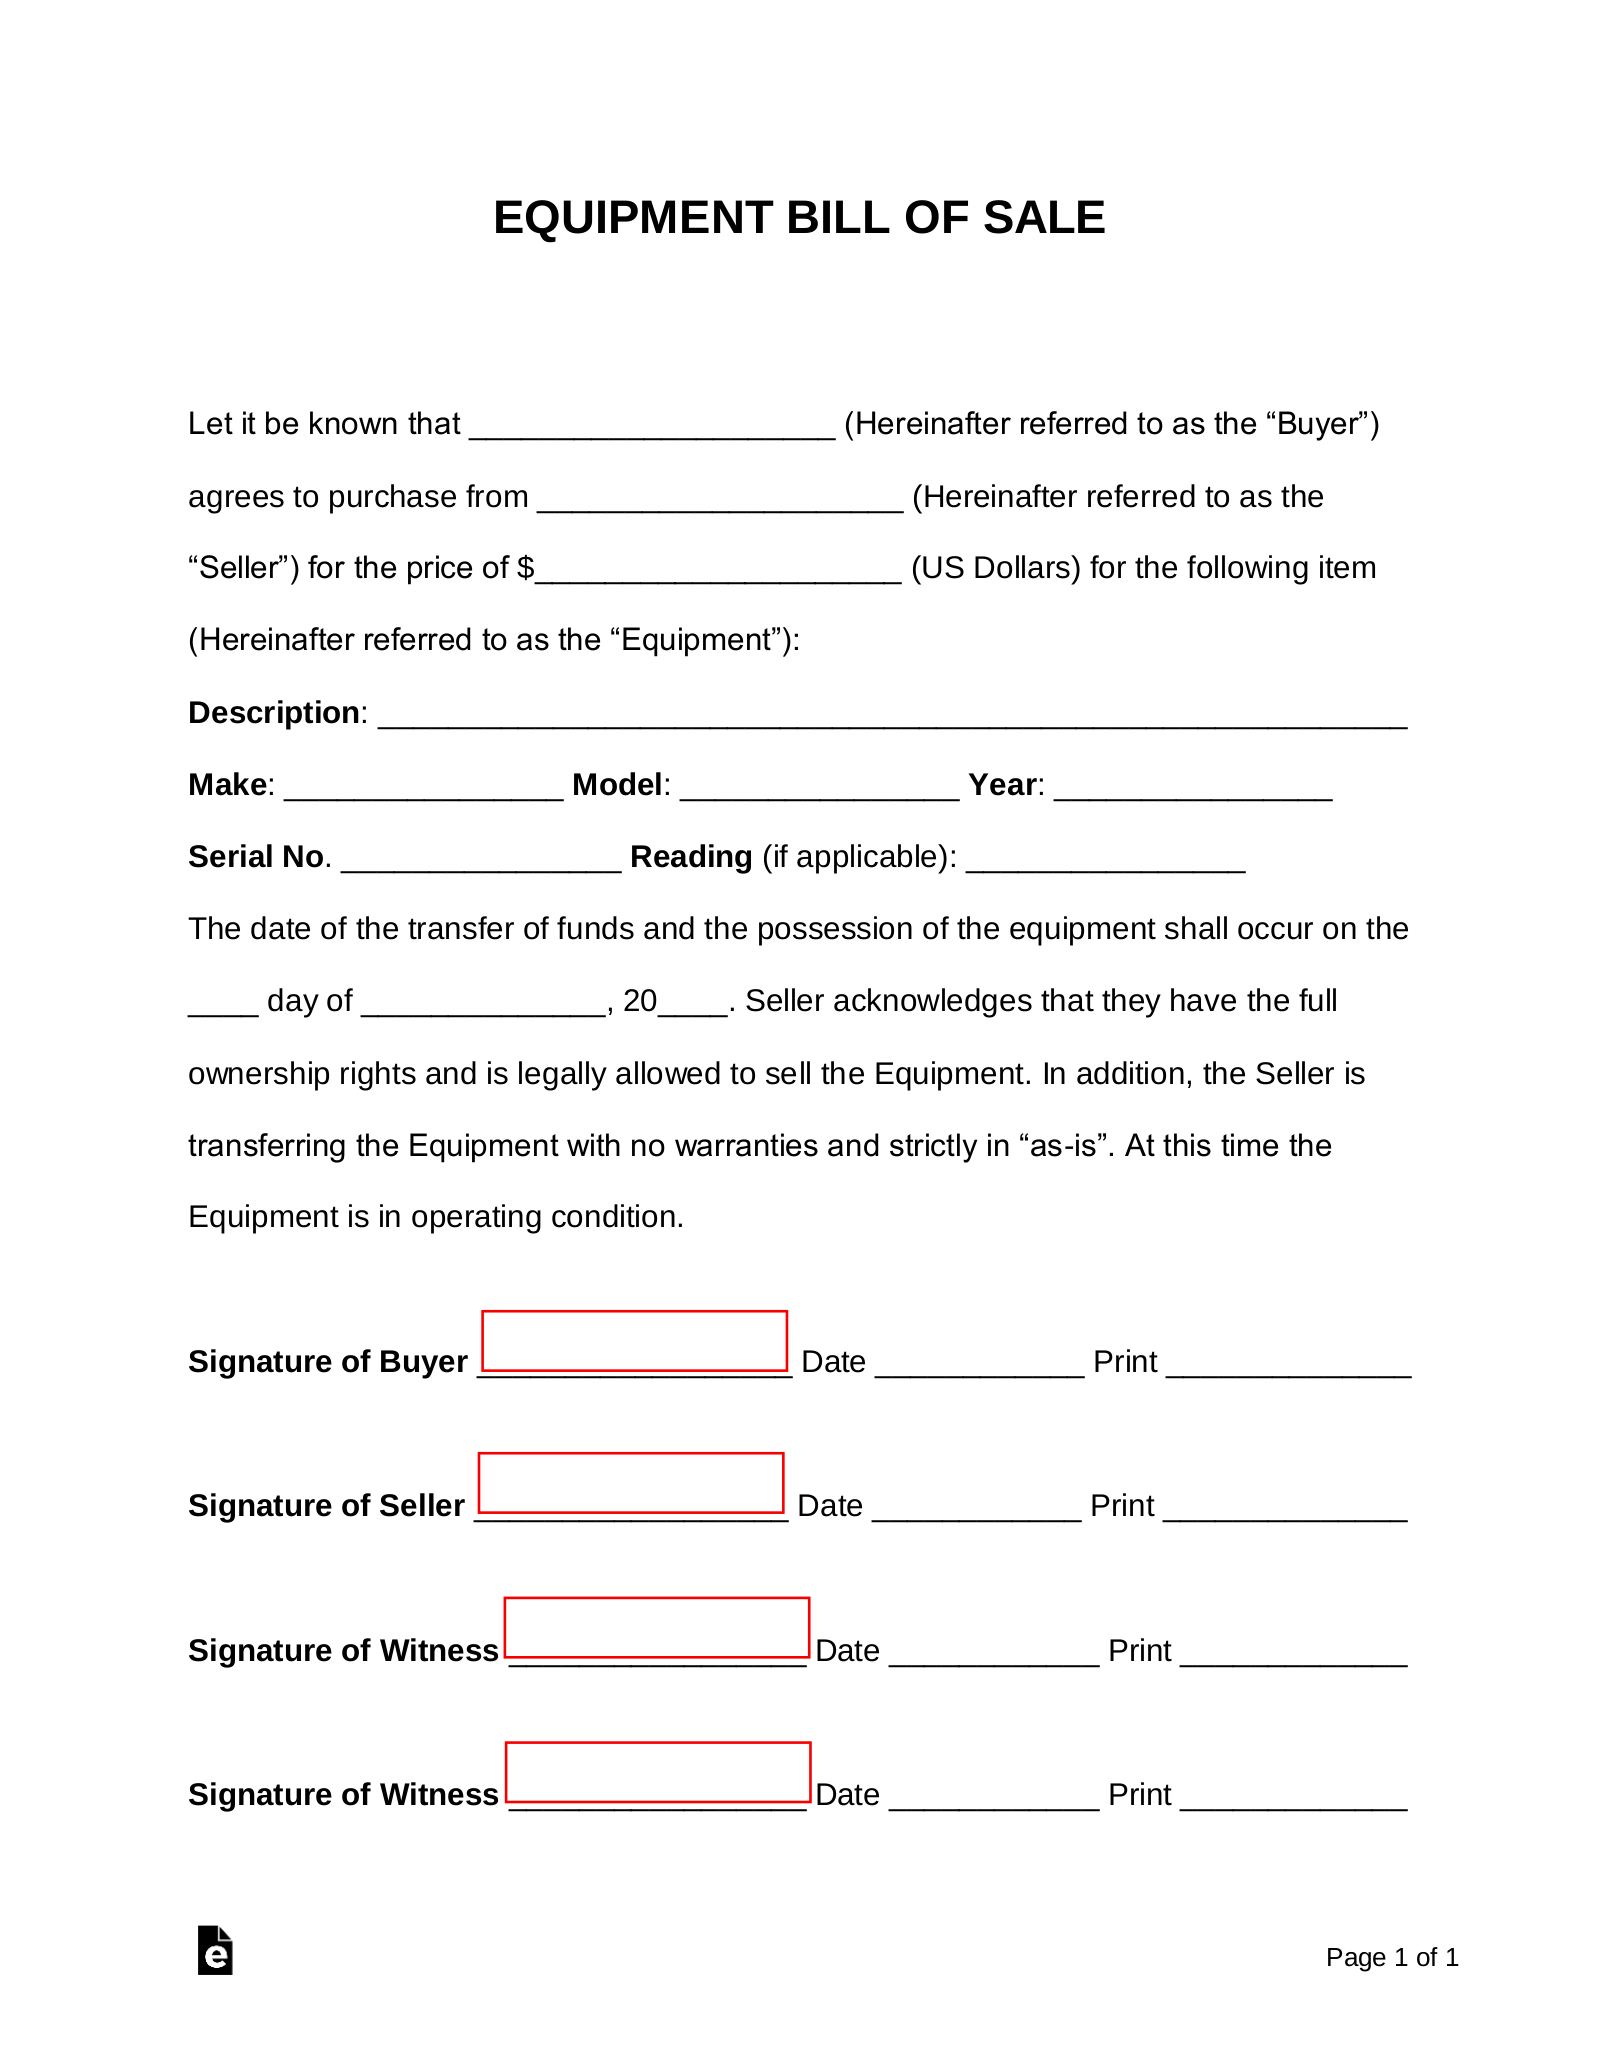 Free Equipment Bill Of Sale Form